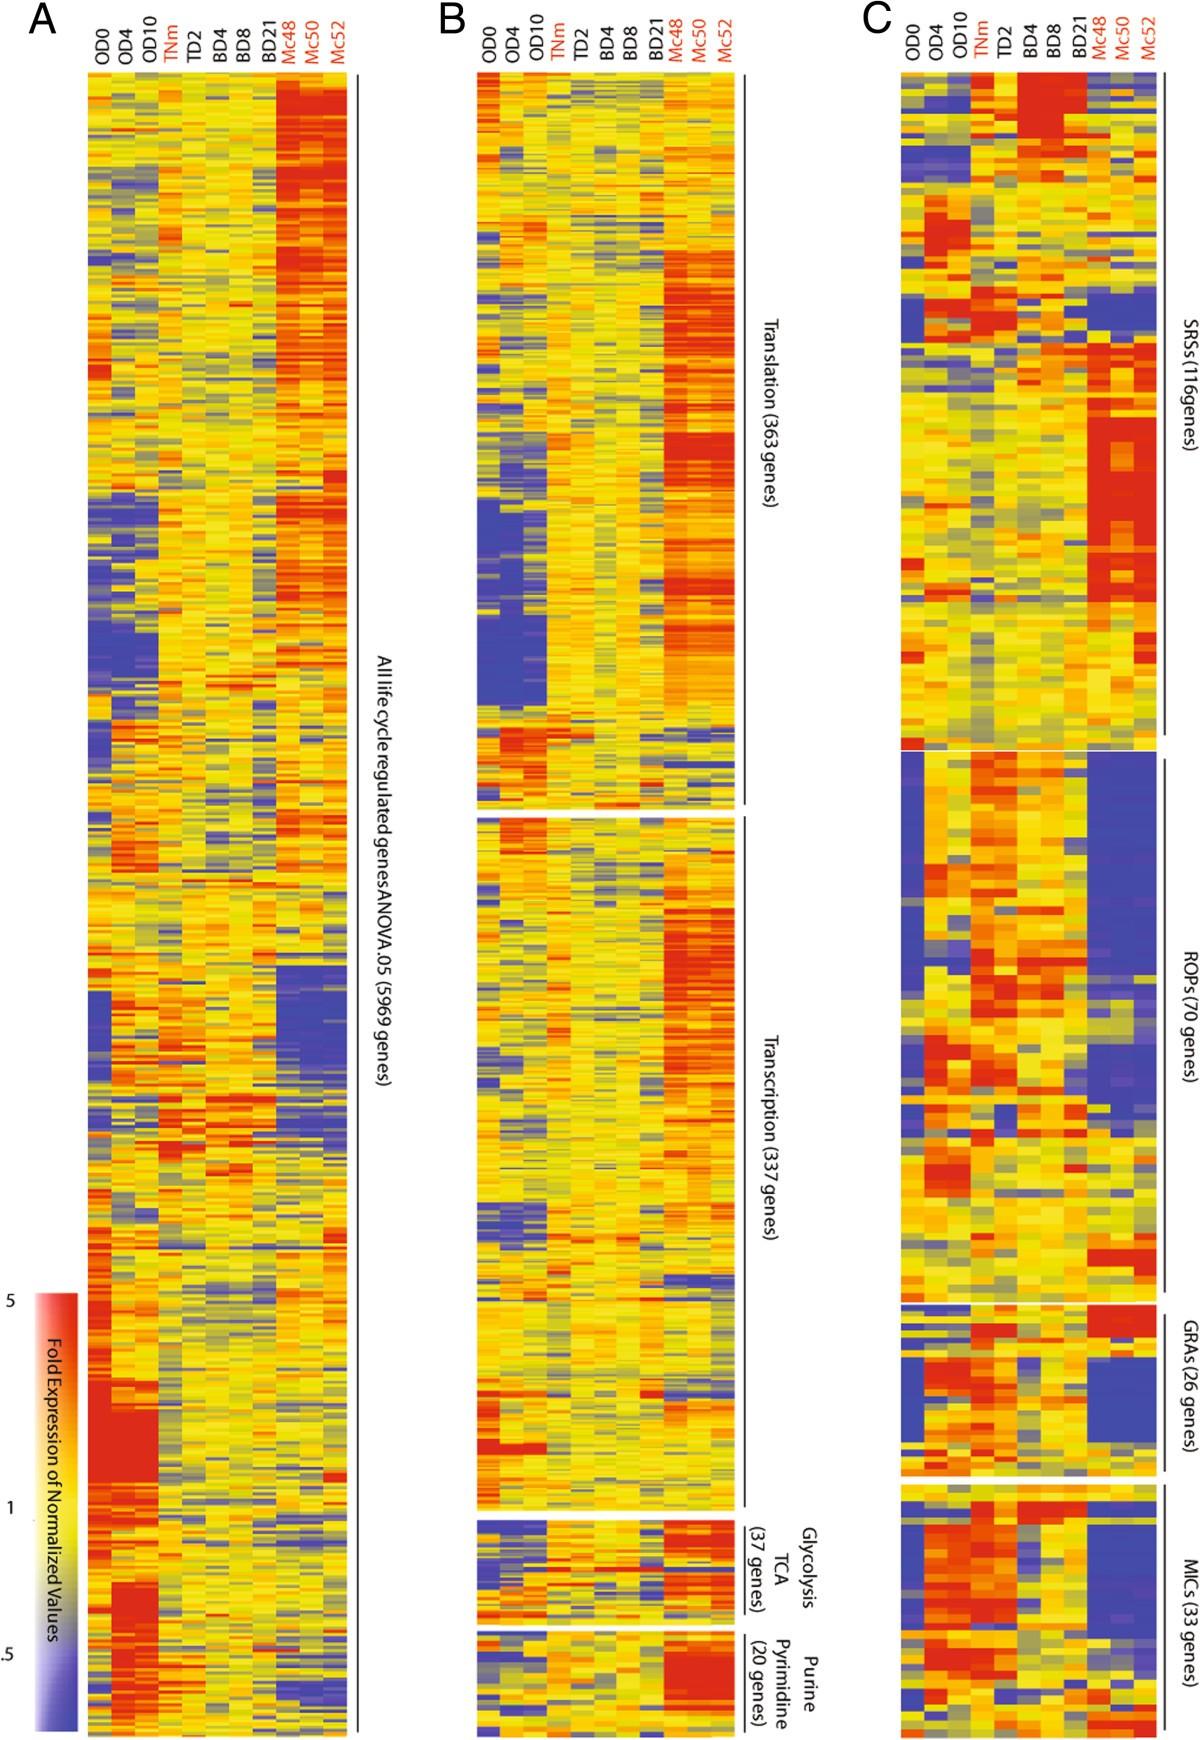 Toxoplasma gondii merozoite gene expression analysis with parison